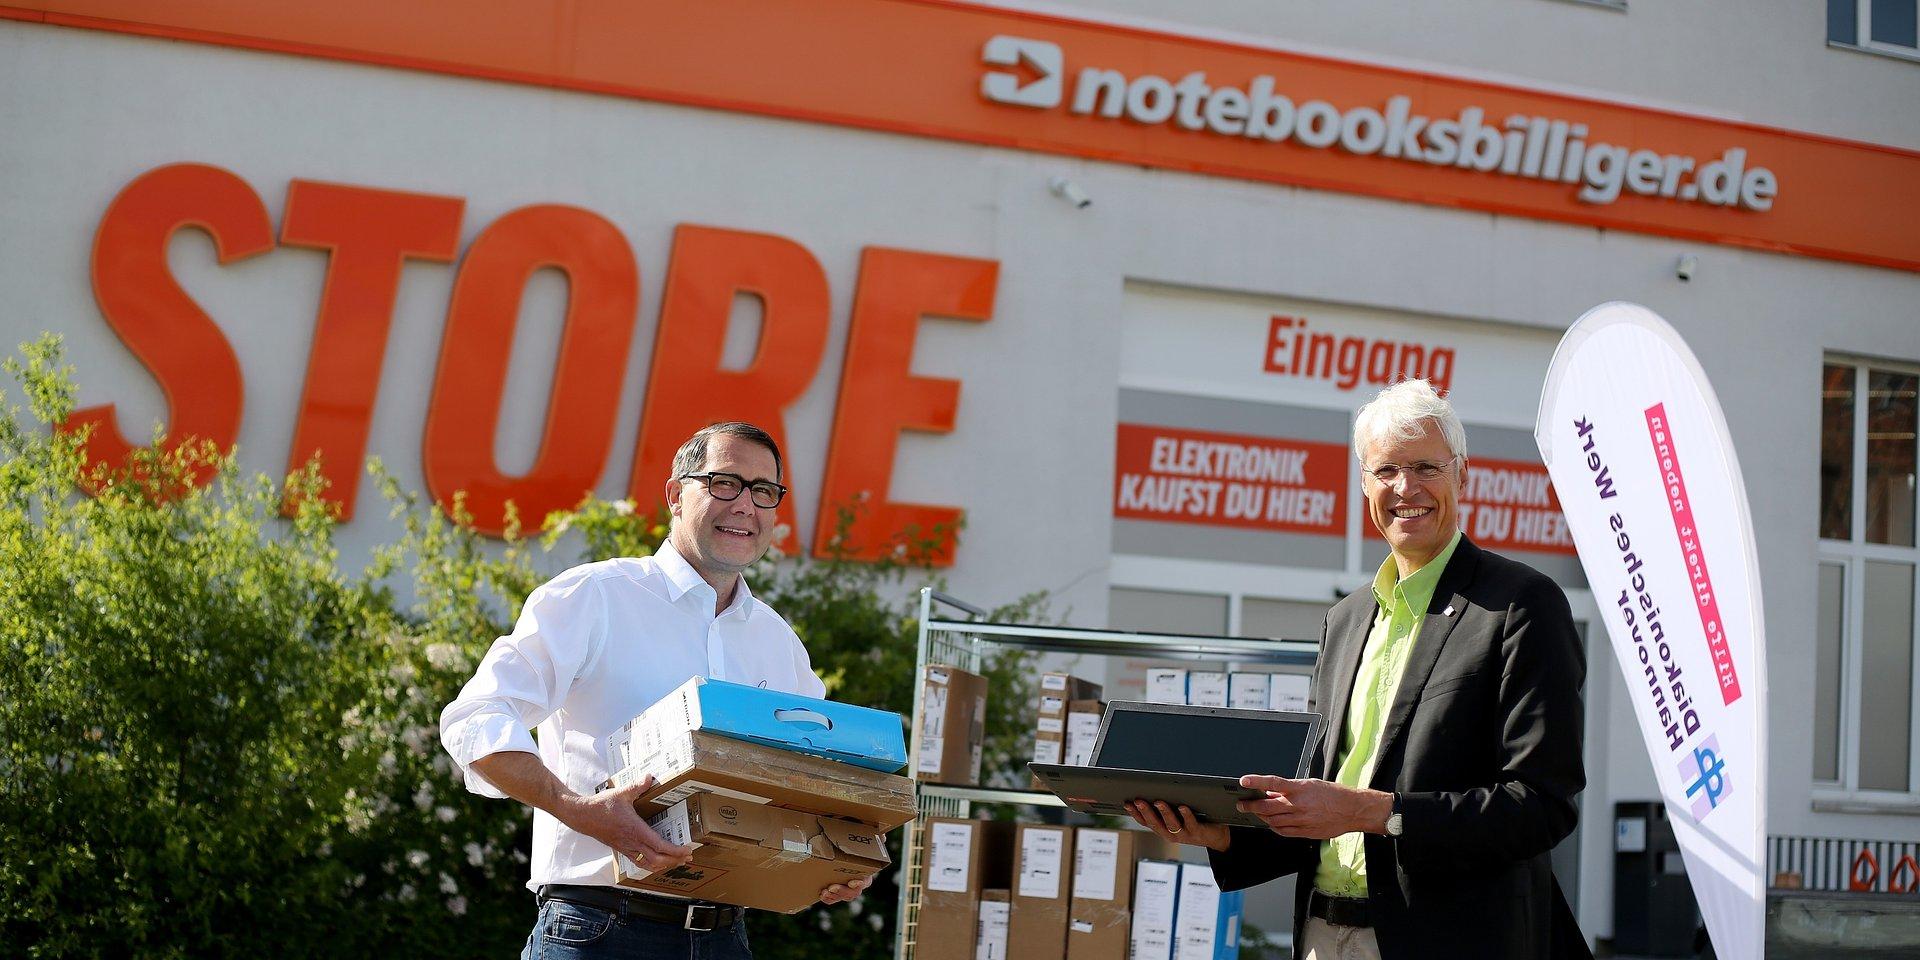 Digitaler Unterricht: NBB spendet Notebooks für Schüler